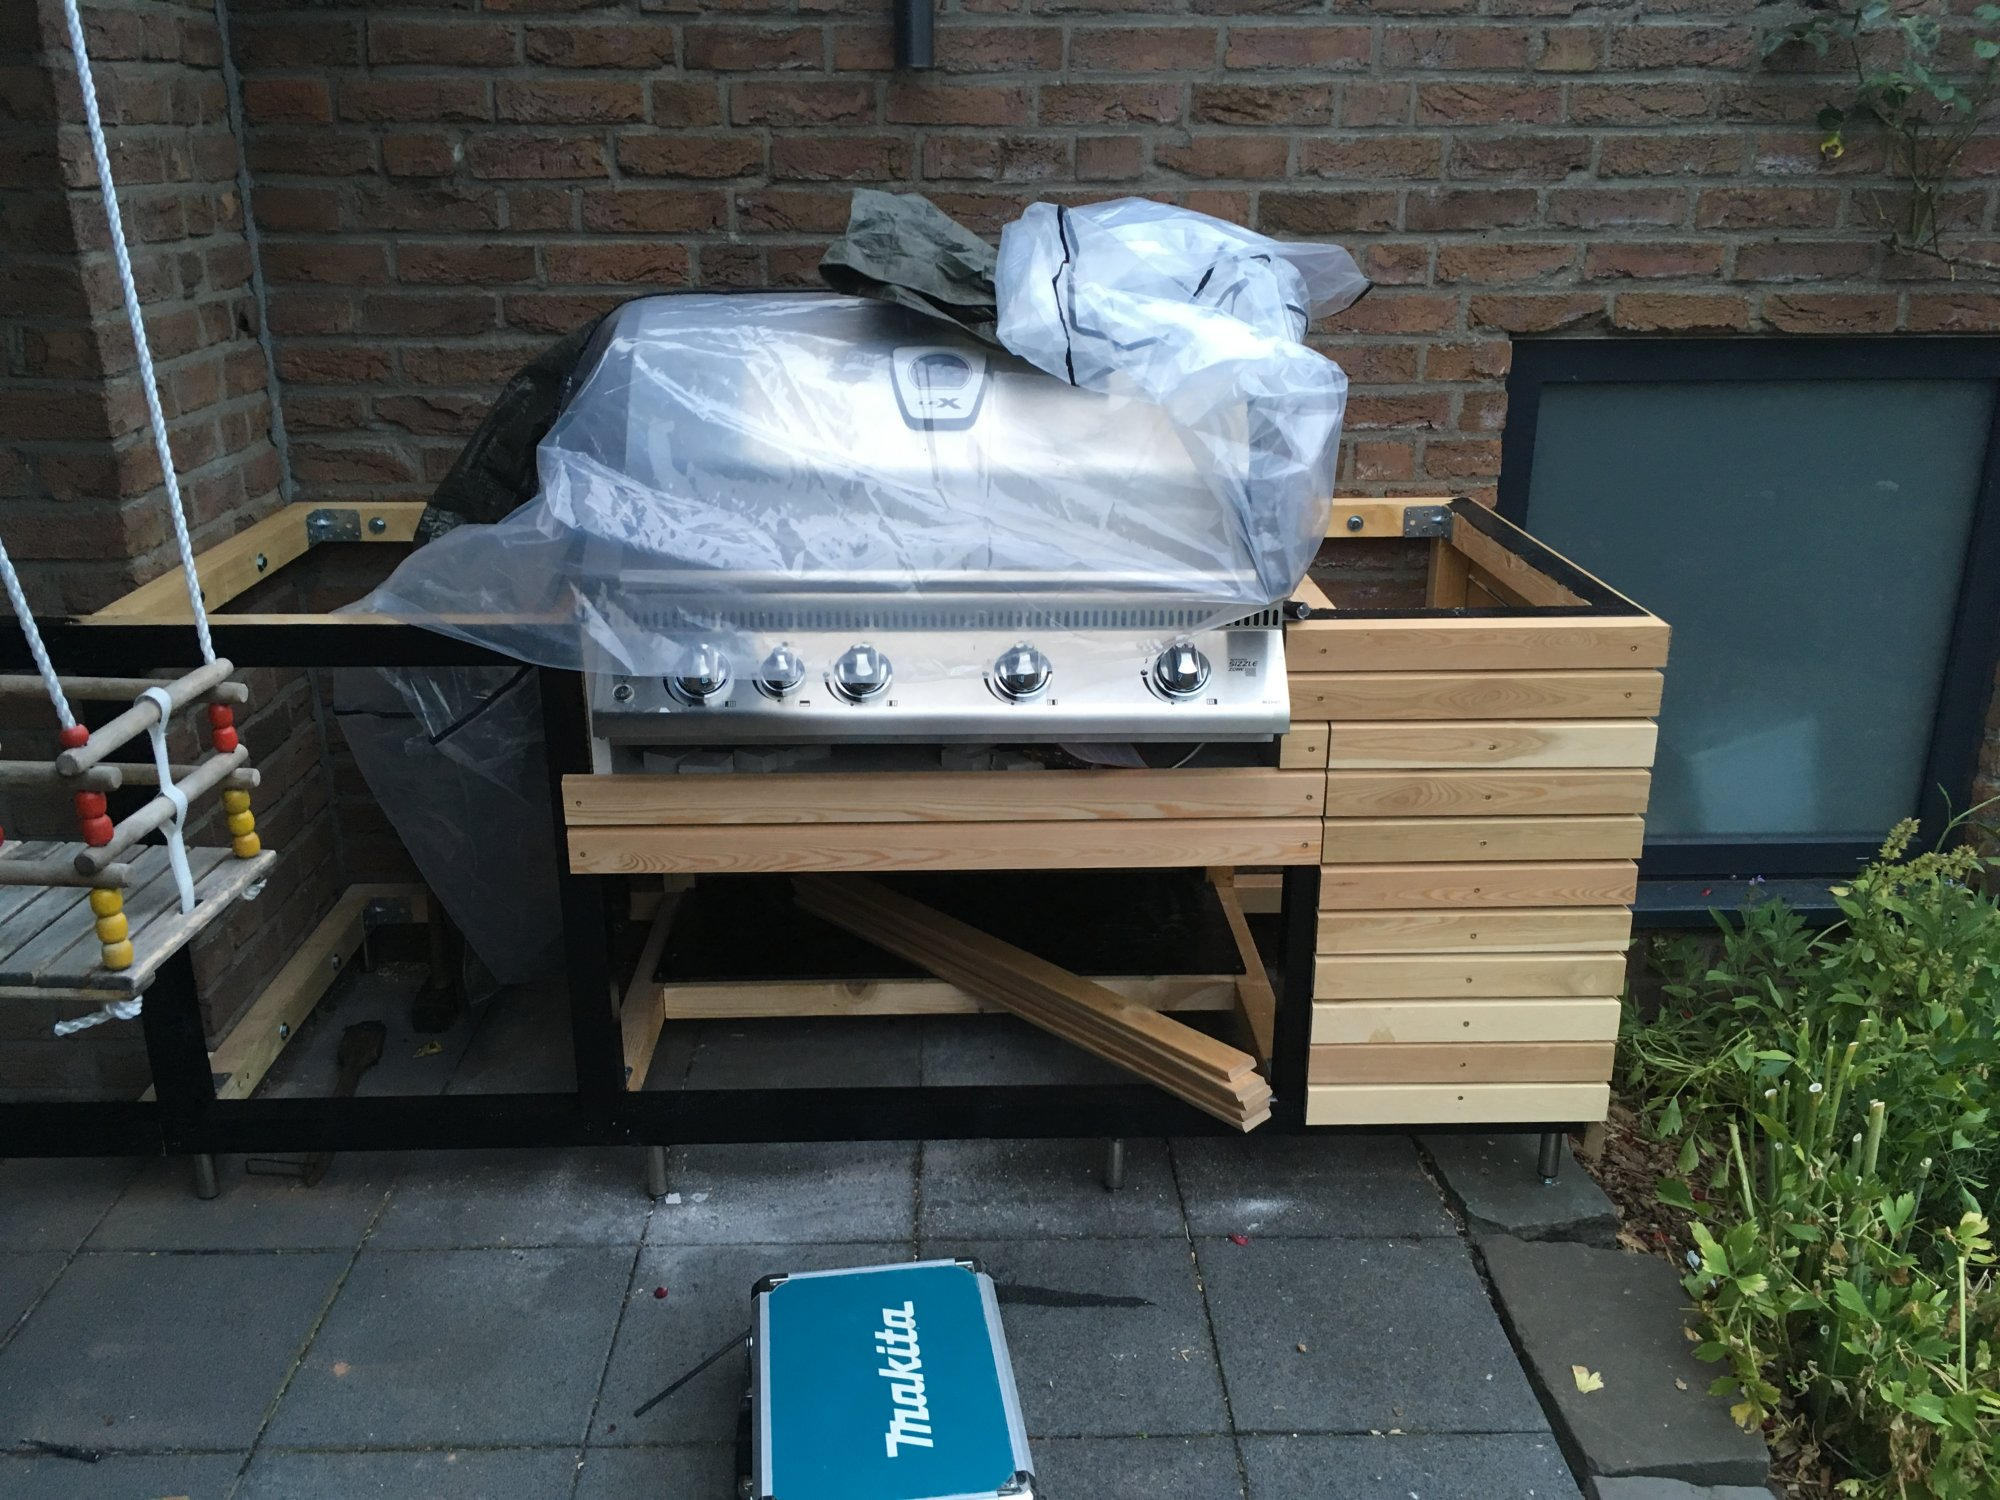 Outdoor Küche Edelstahl Reinigen : Edelstahl tür outdoor küche wieviel lumen in der küche kleine